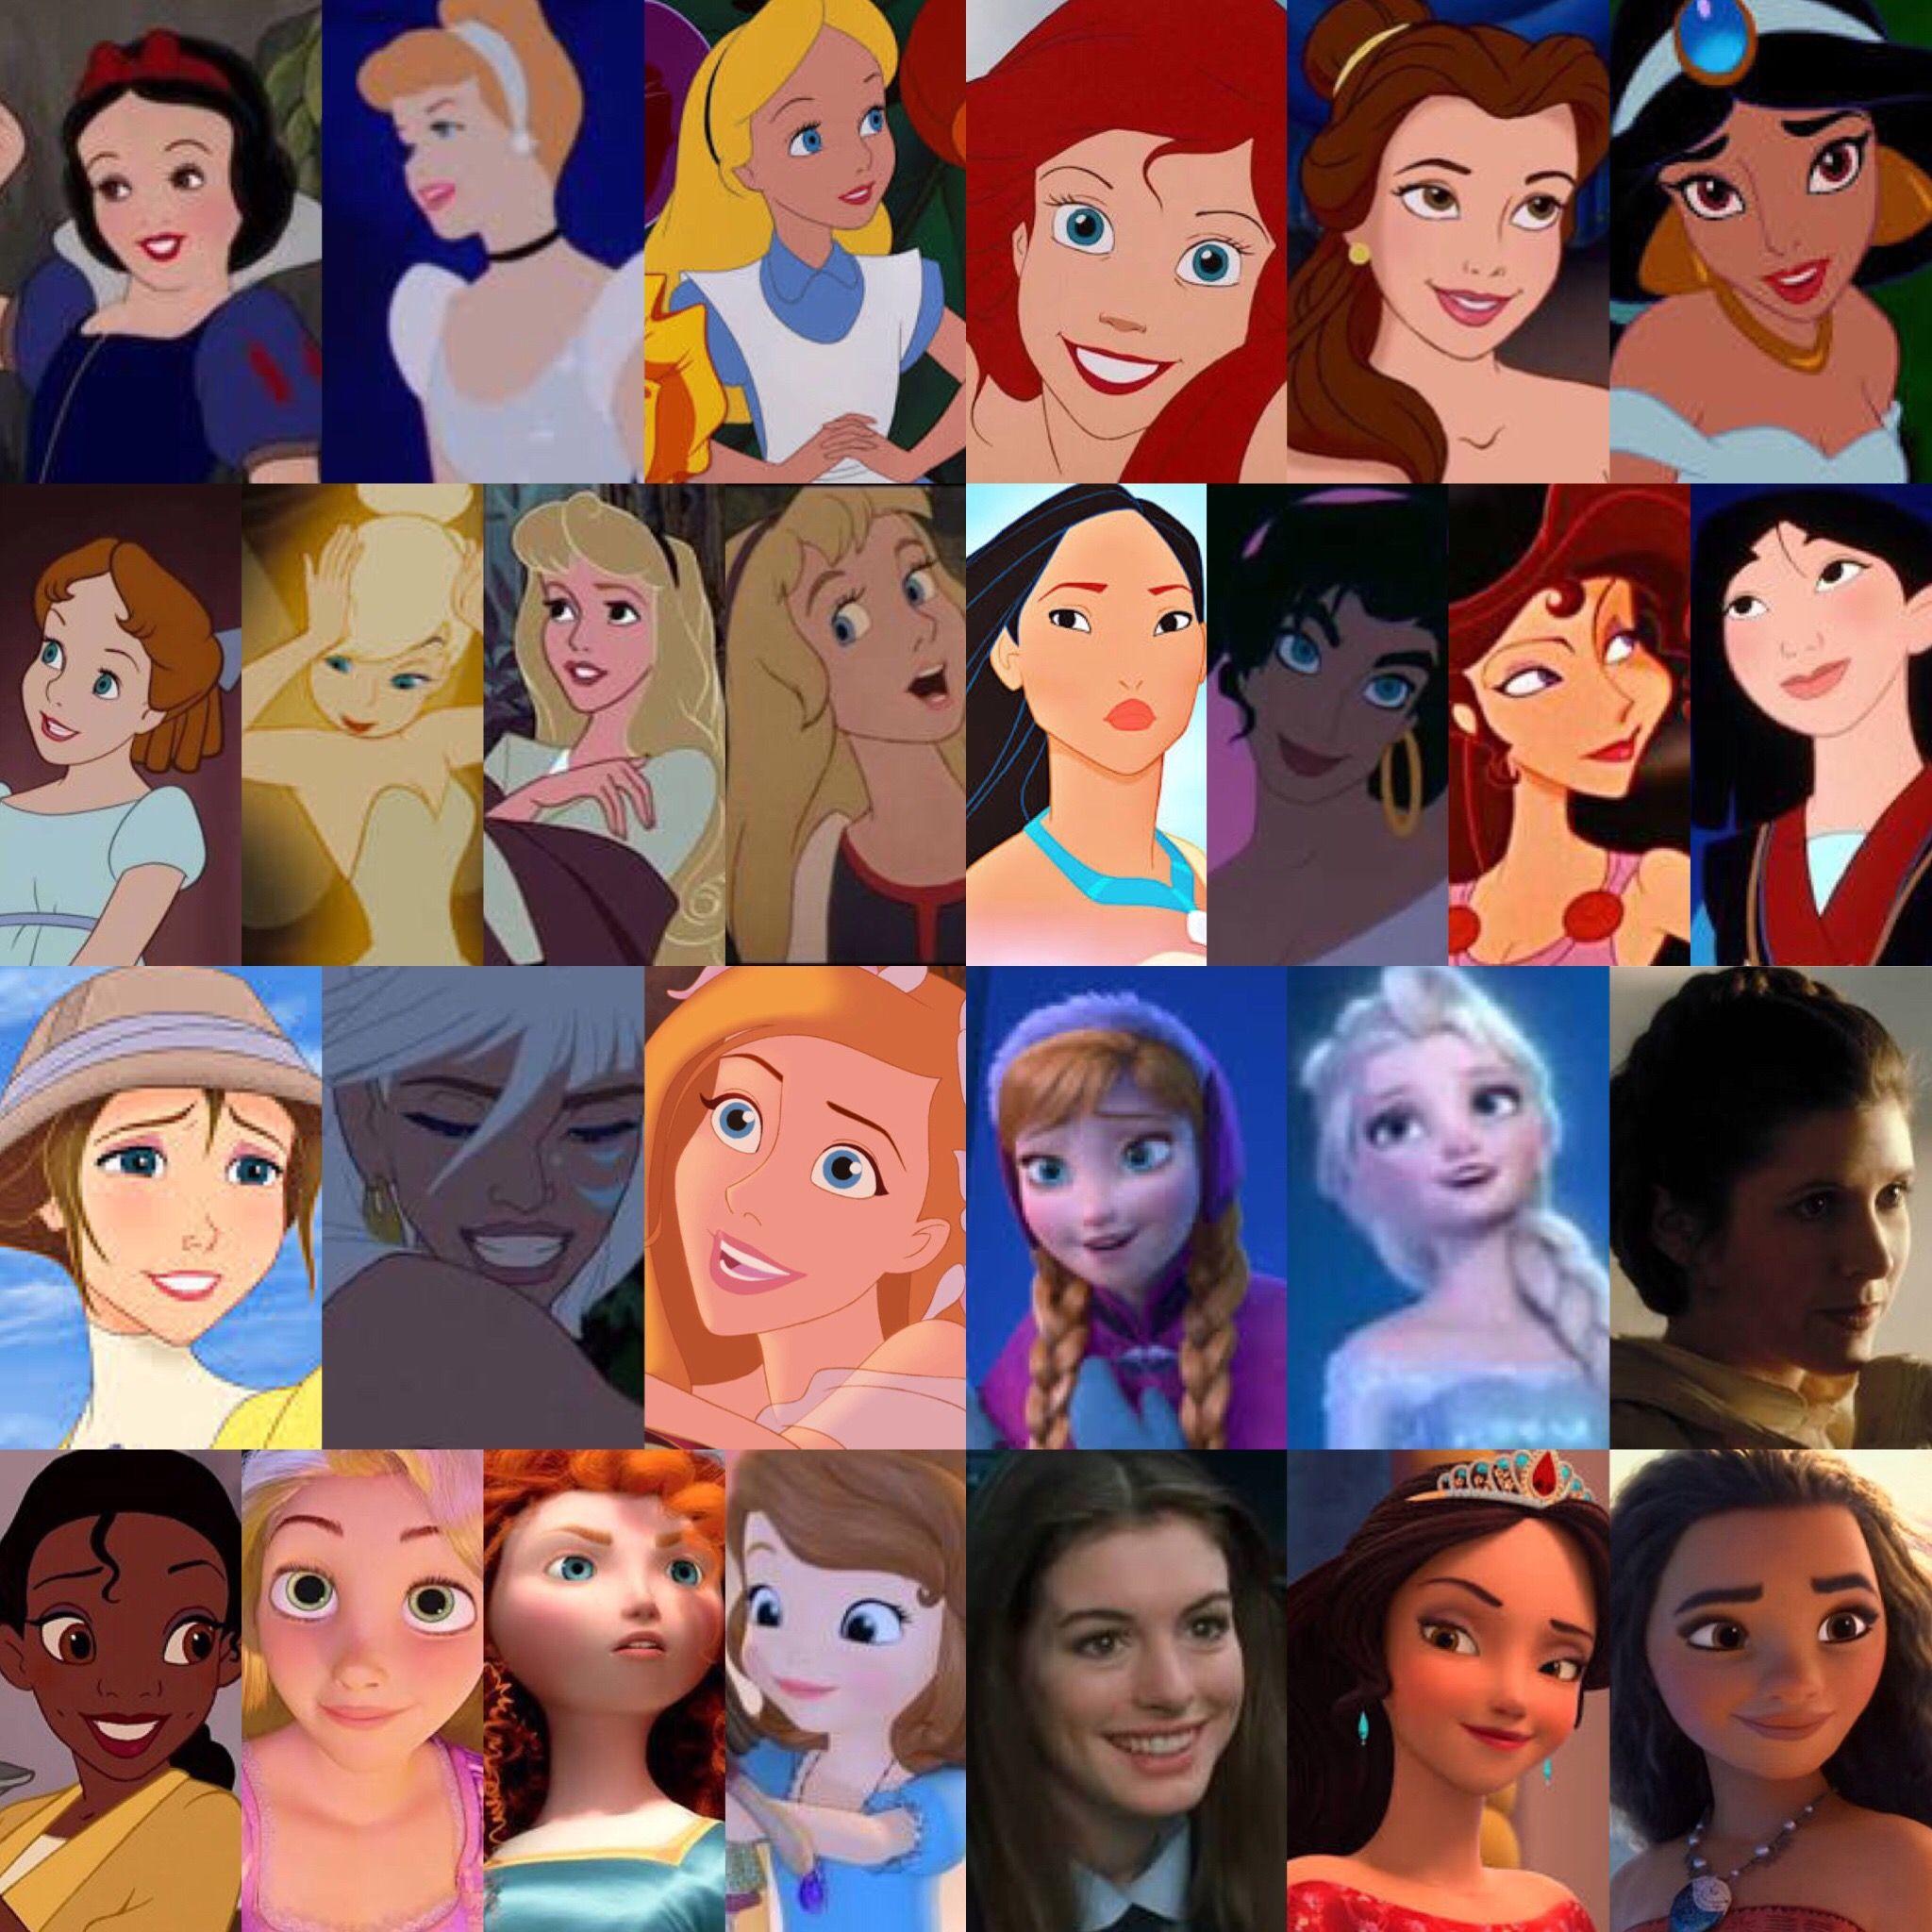 Персонажи диснея картинки с именами